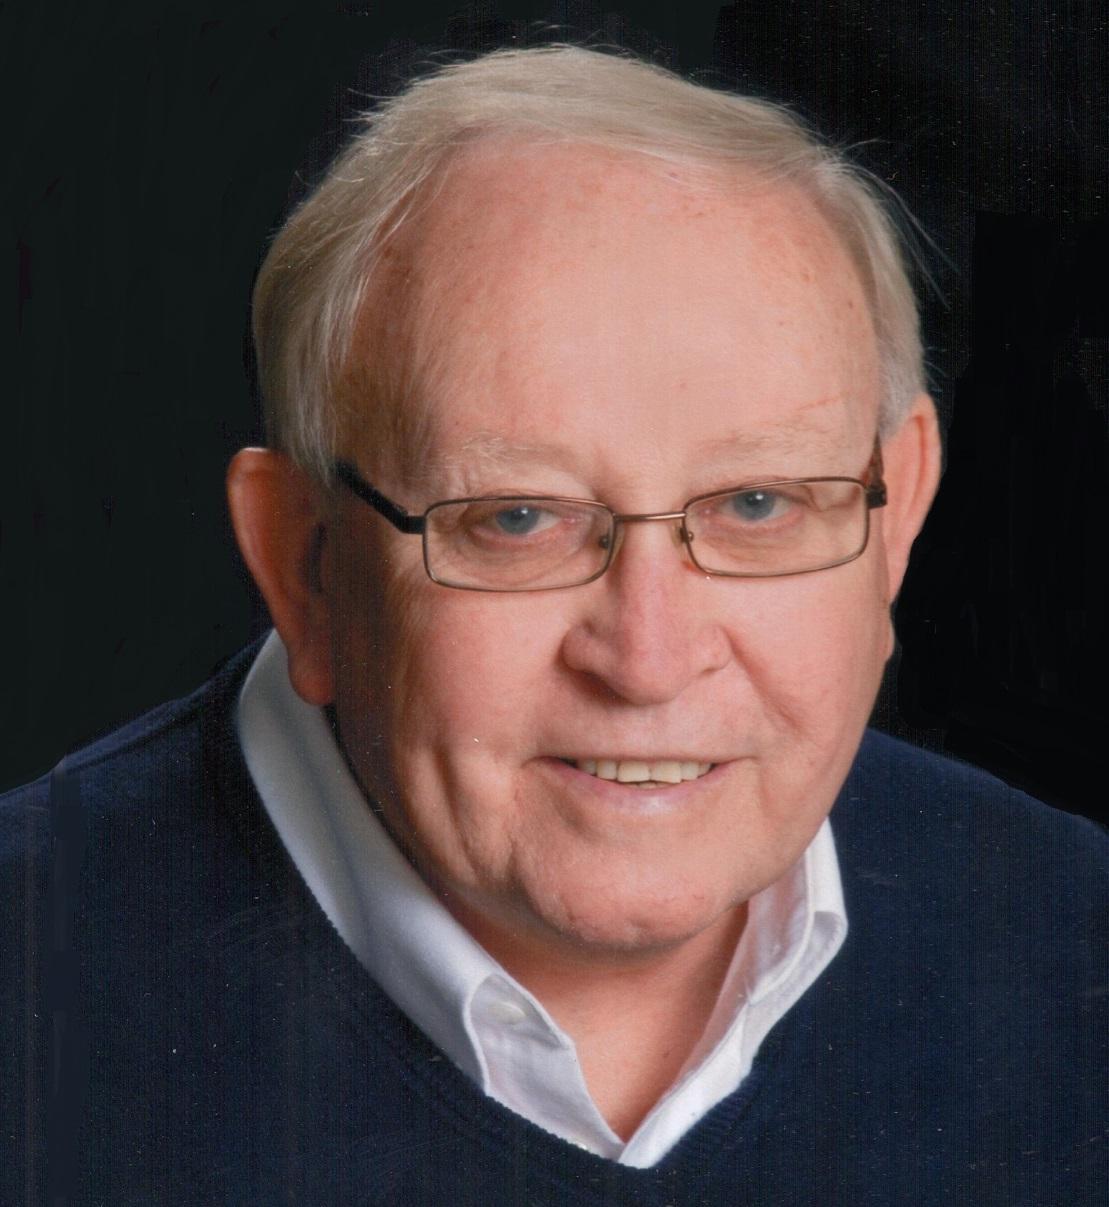 Thomas A. Schum, age 77 of Ireland